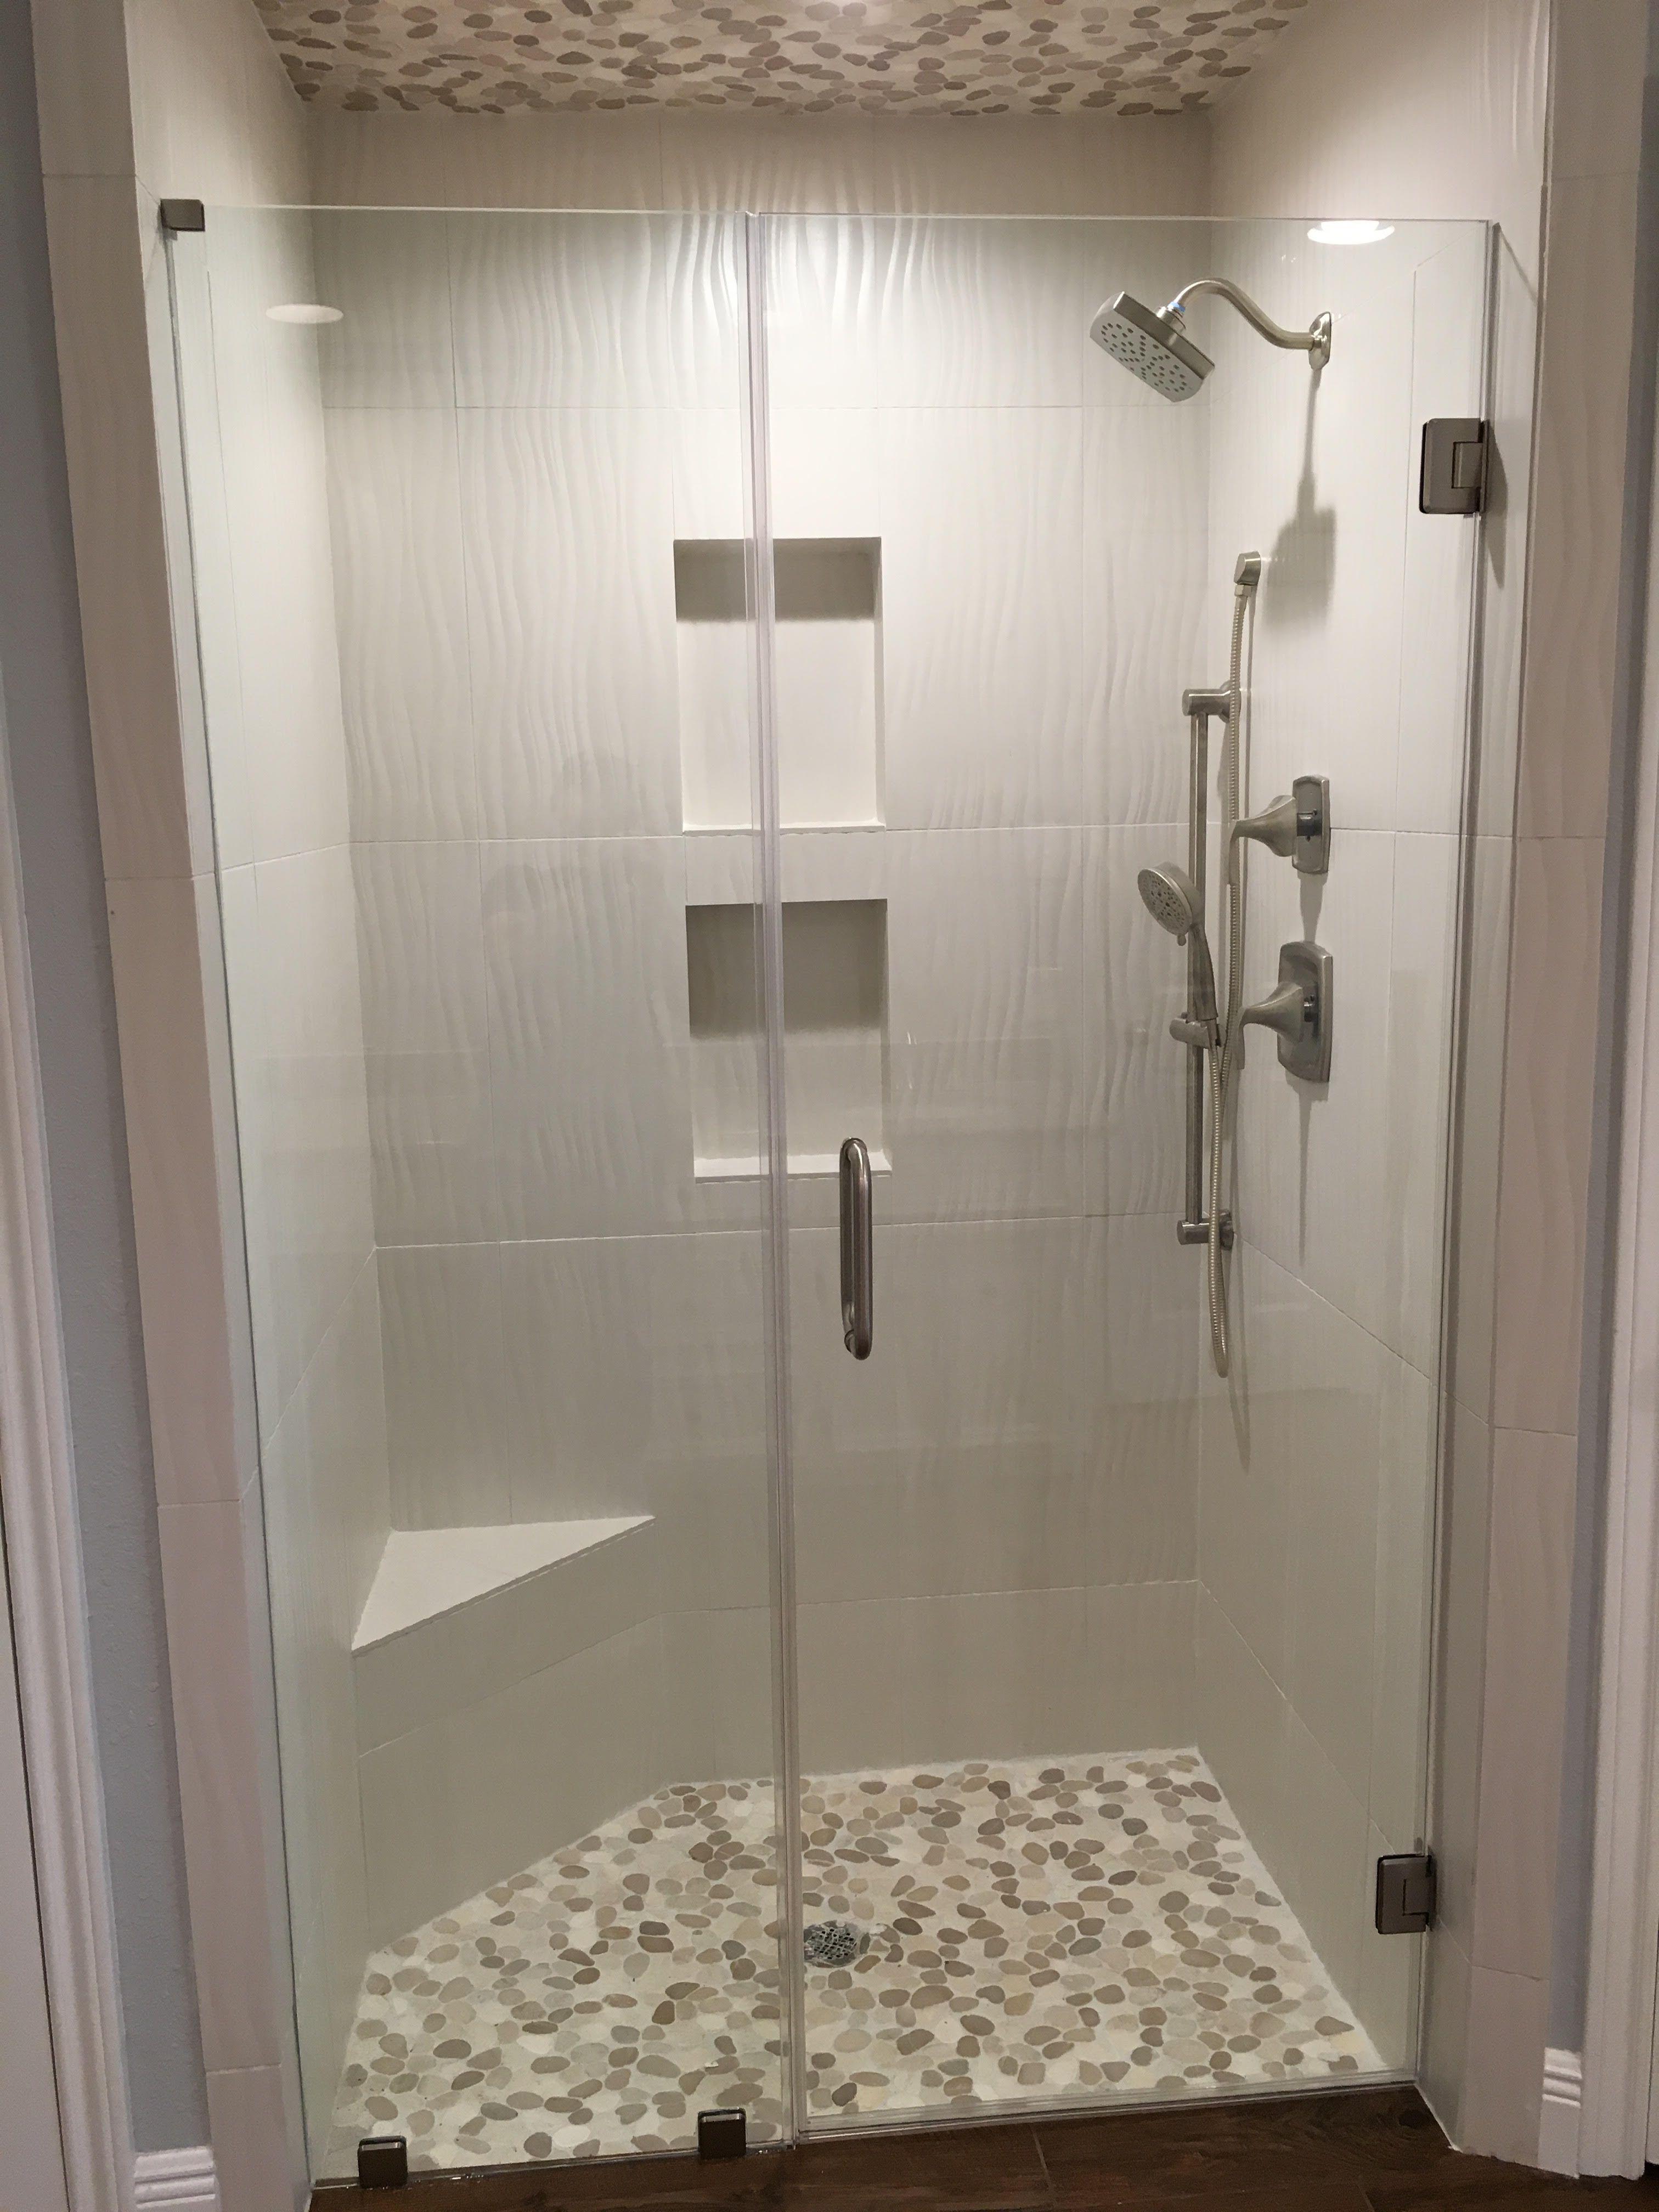 Sliced Java Tan And White Pebble Tile Bathroom Remodel Shower